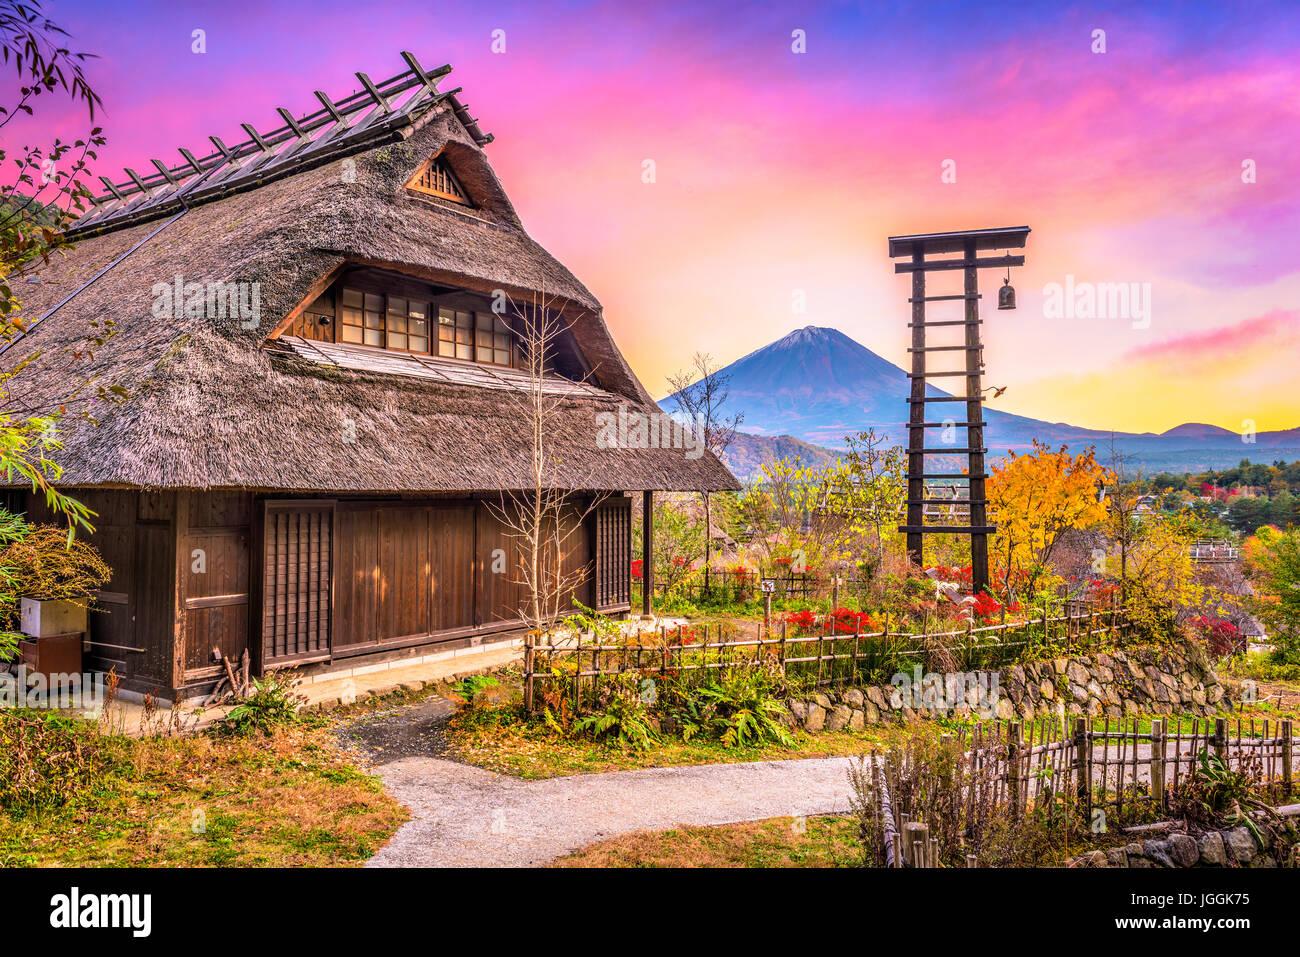 Mt. Fuji, Japon village historique avec Iyashi no Sato en automne Photo Stock